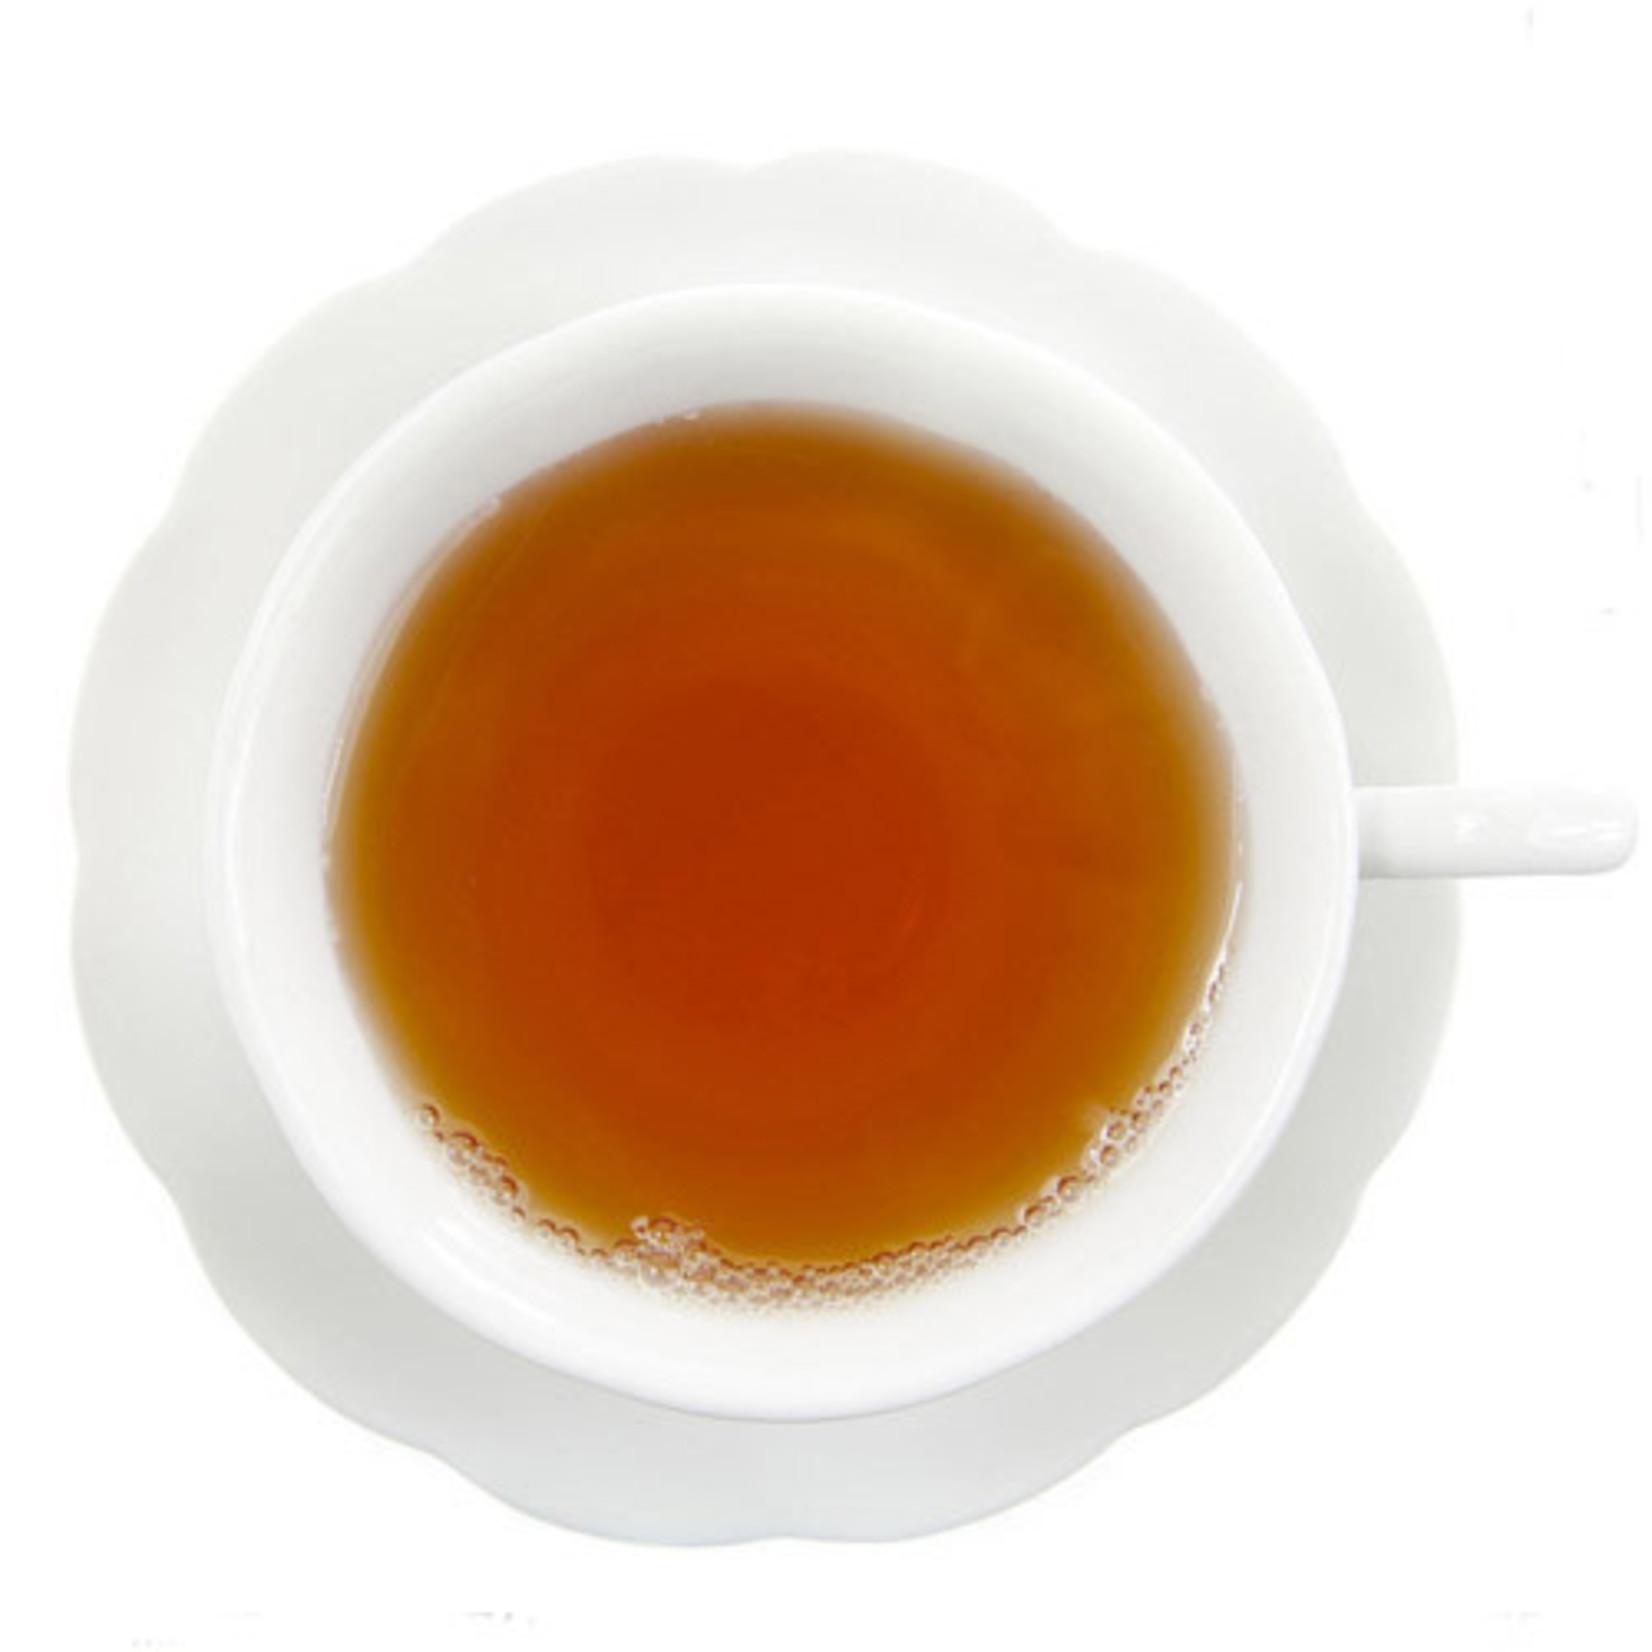 BrewBakers Tea Lovers Leap 50g